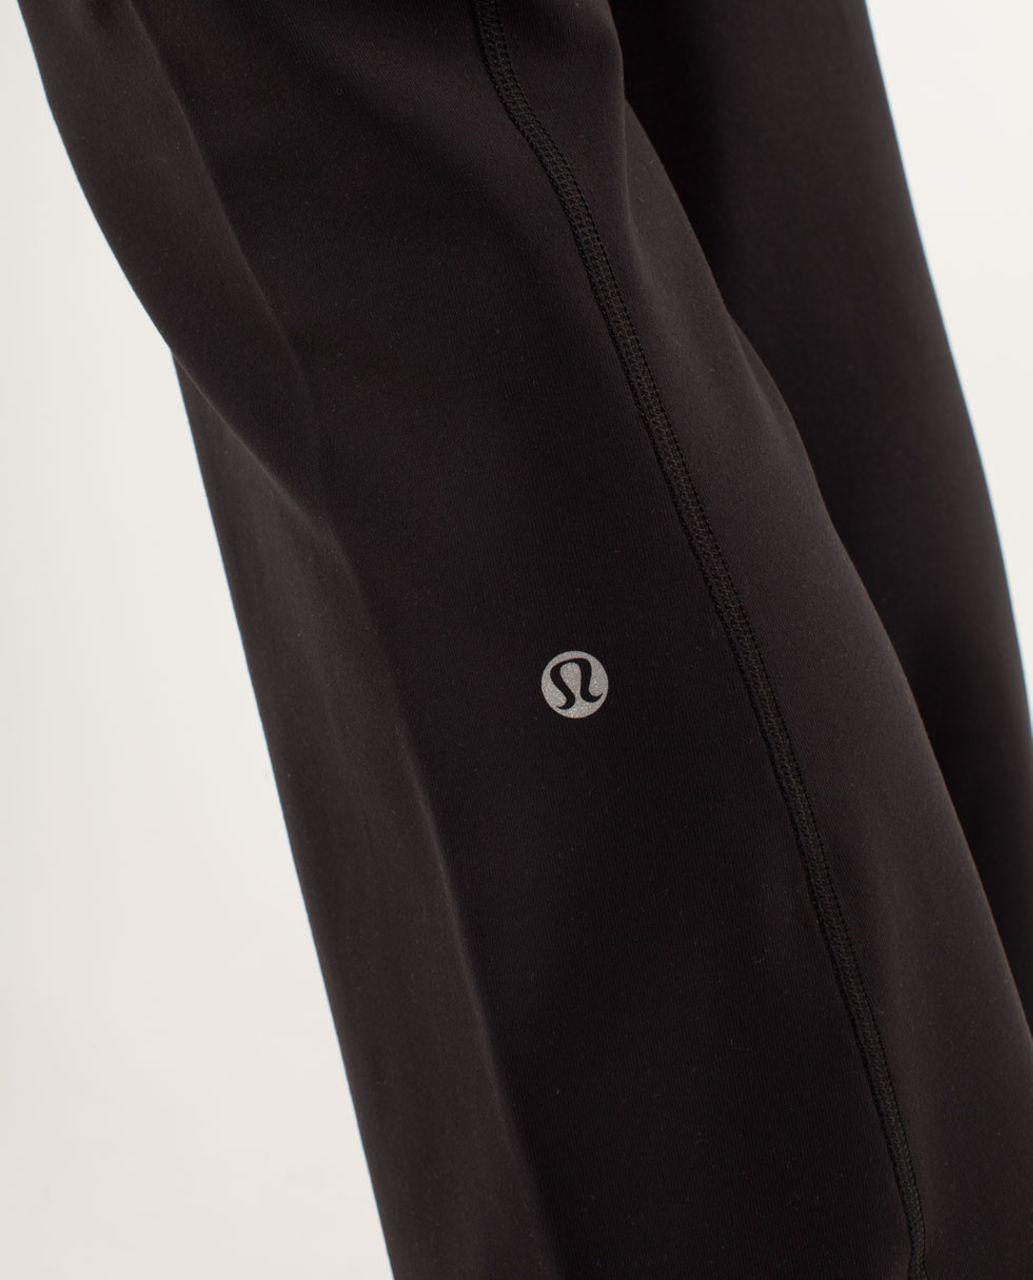 Lululemon Groove Pant *New (Tall) - Black / Quilt Spring13 7